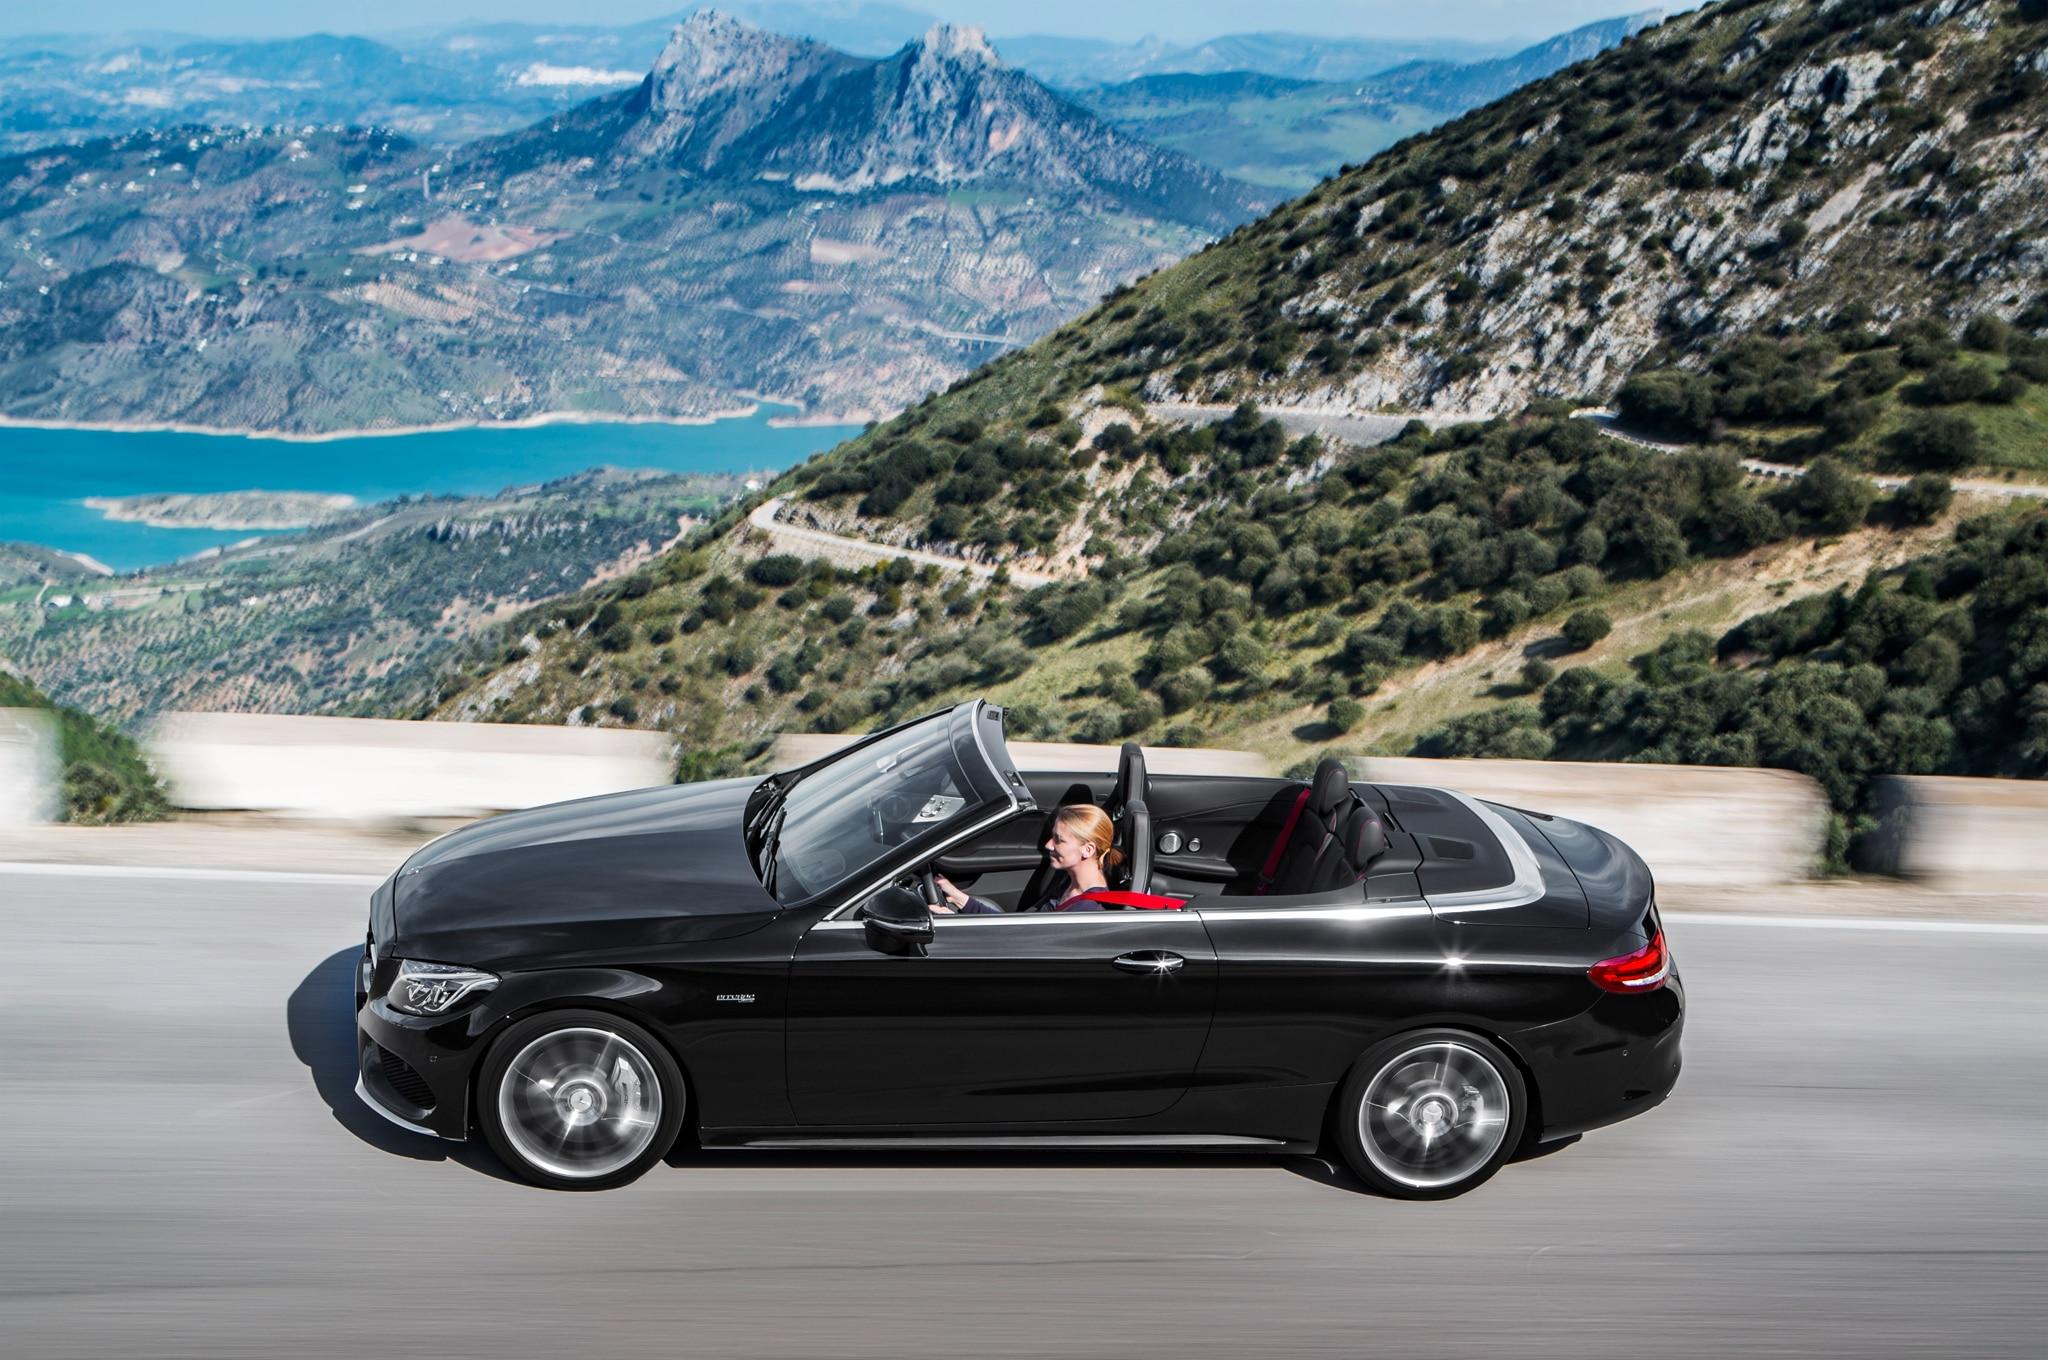 2017 mercedes benz c class cabriolet revealed in c300 amg c43 guises automobile magazine. Black Bedroom Furniture Sets. Home Design Ideas